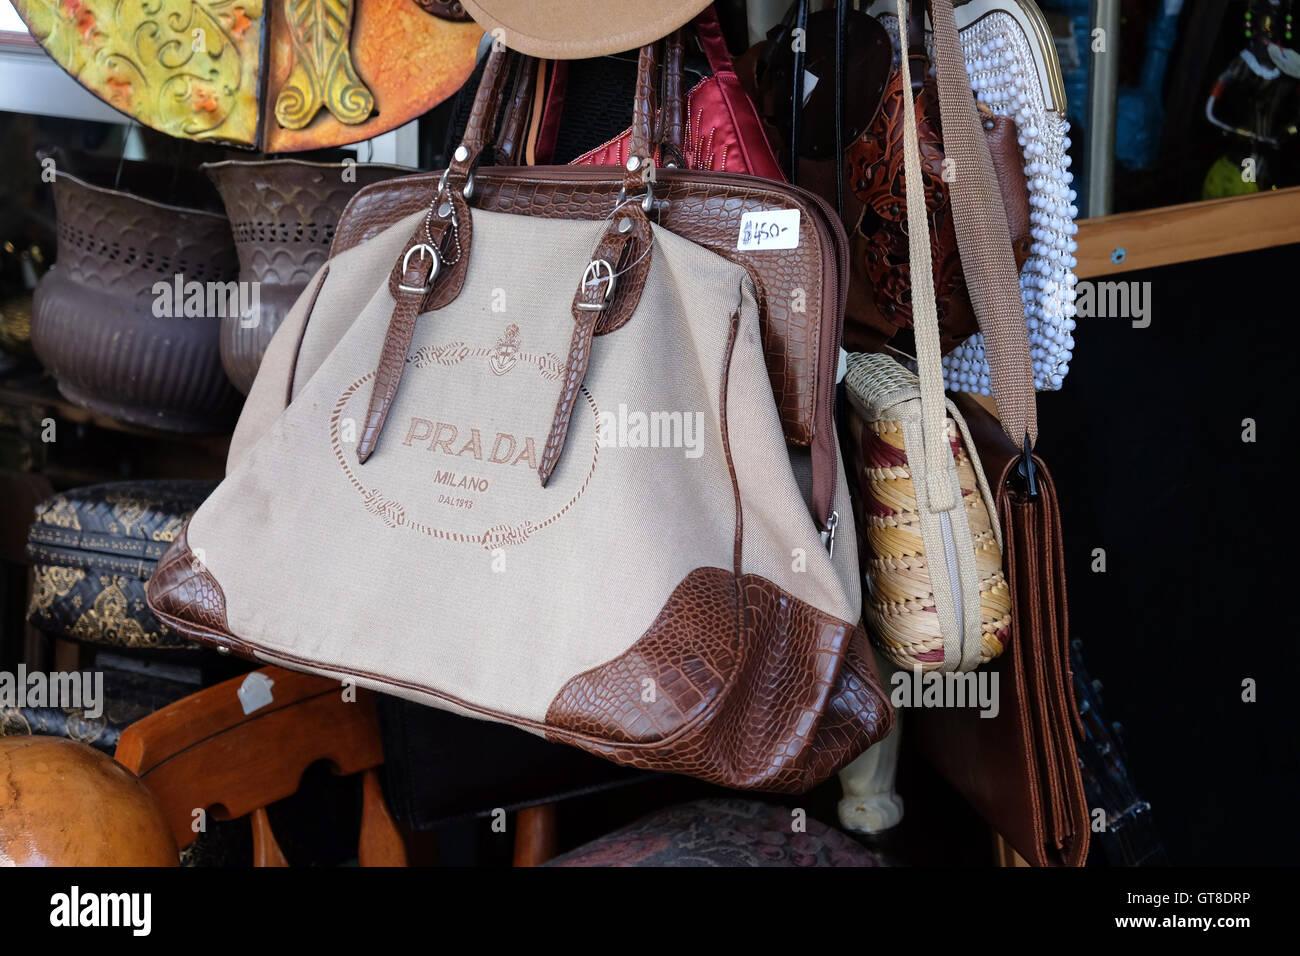 Second-hand Prada travel bag for sale in King st Newtown Sydney Australia 1b5fa13bb0a1e